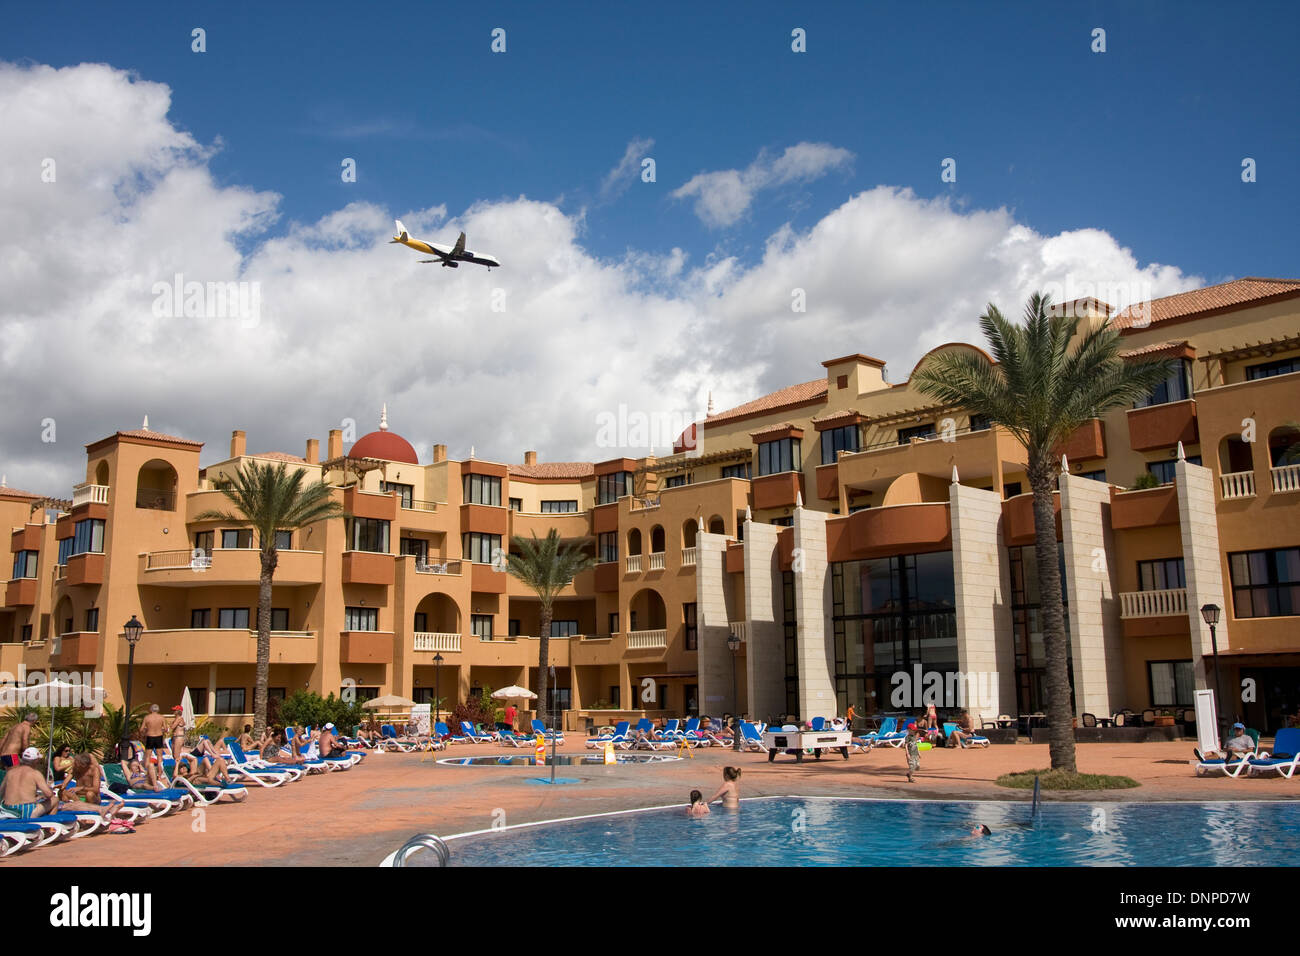 Tenerife Sur Stock Photos & Tenerife Sur Stock Images - Alamy